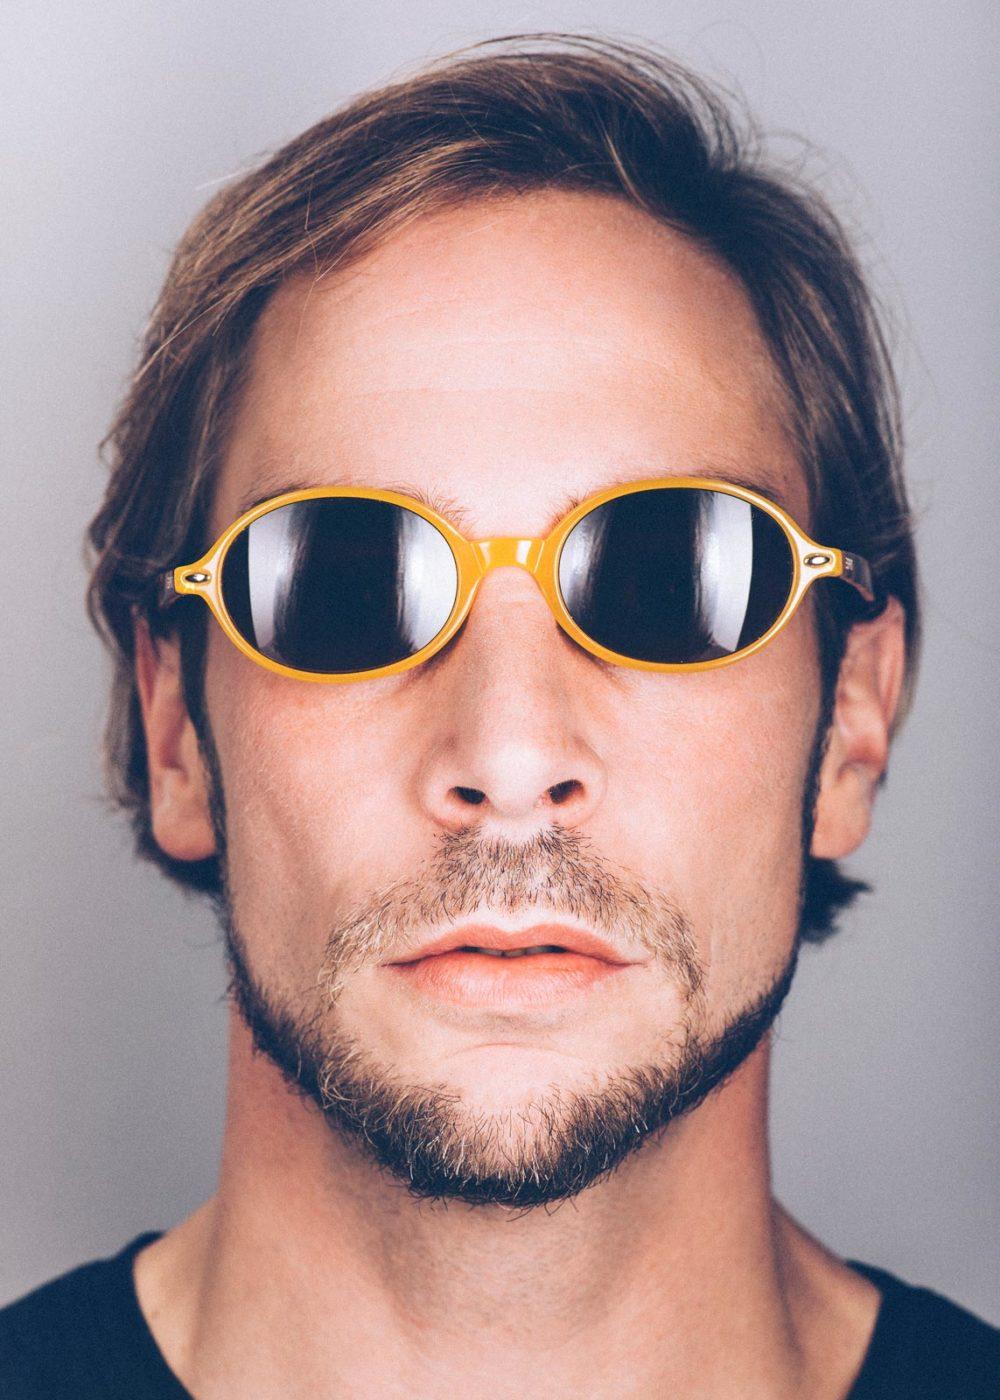 Studiofotografie, Portrait Fotografie, Fashionfotografie, Facetime, Sunglasses,